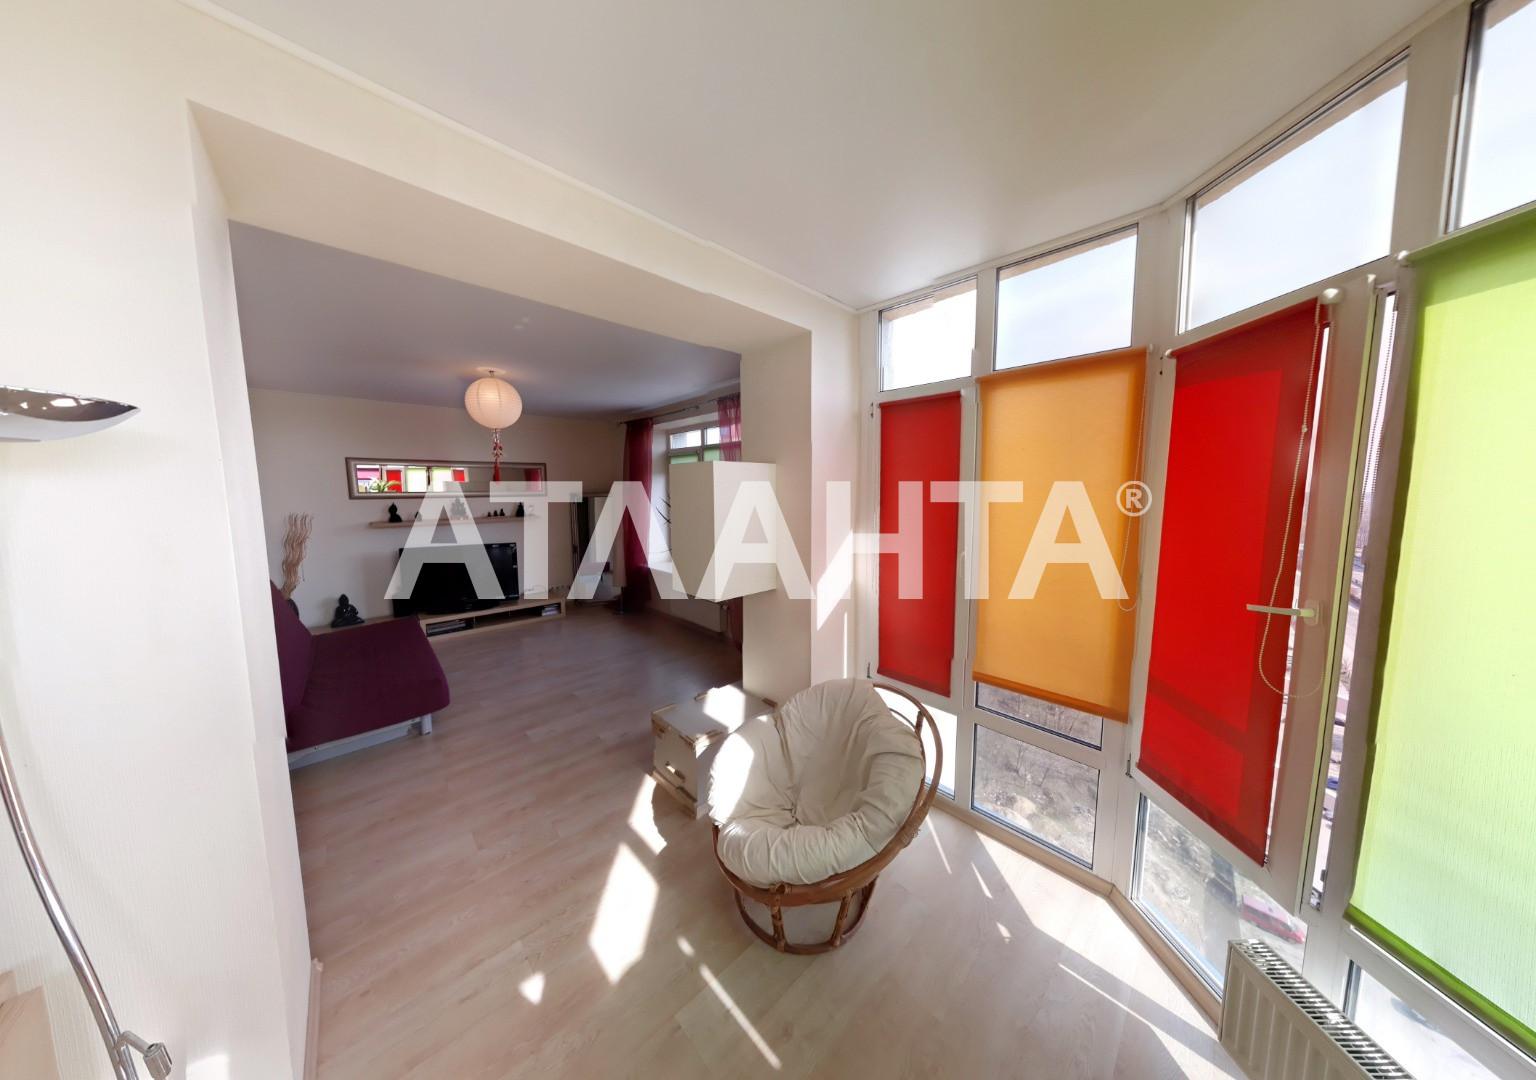 Продается 3-комнатная Квартира на ул. Ломоносова — 118 900 у.е. (фото №10)